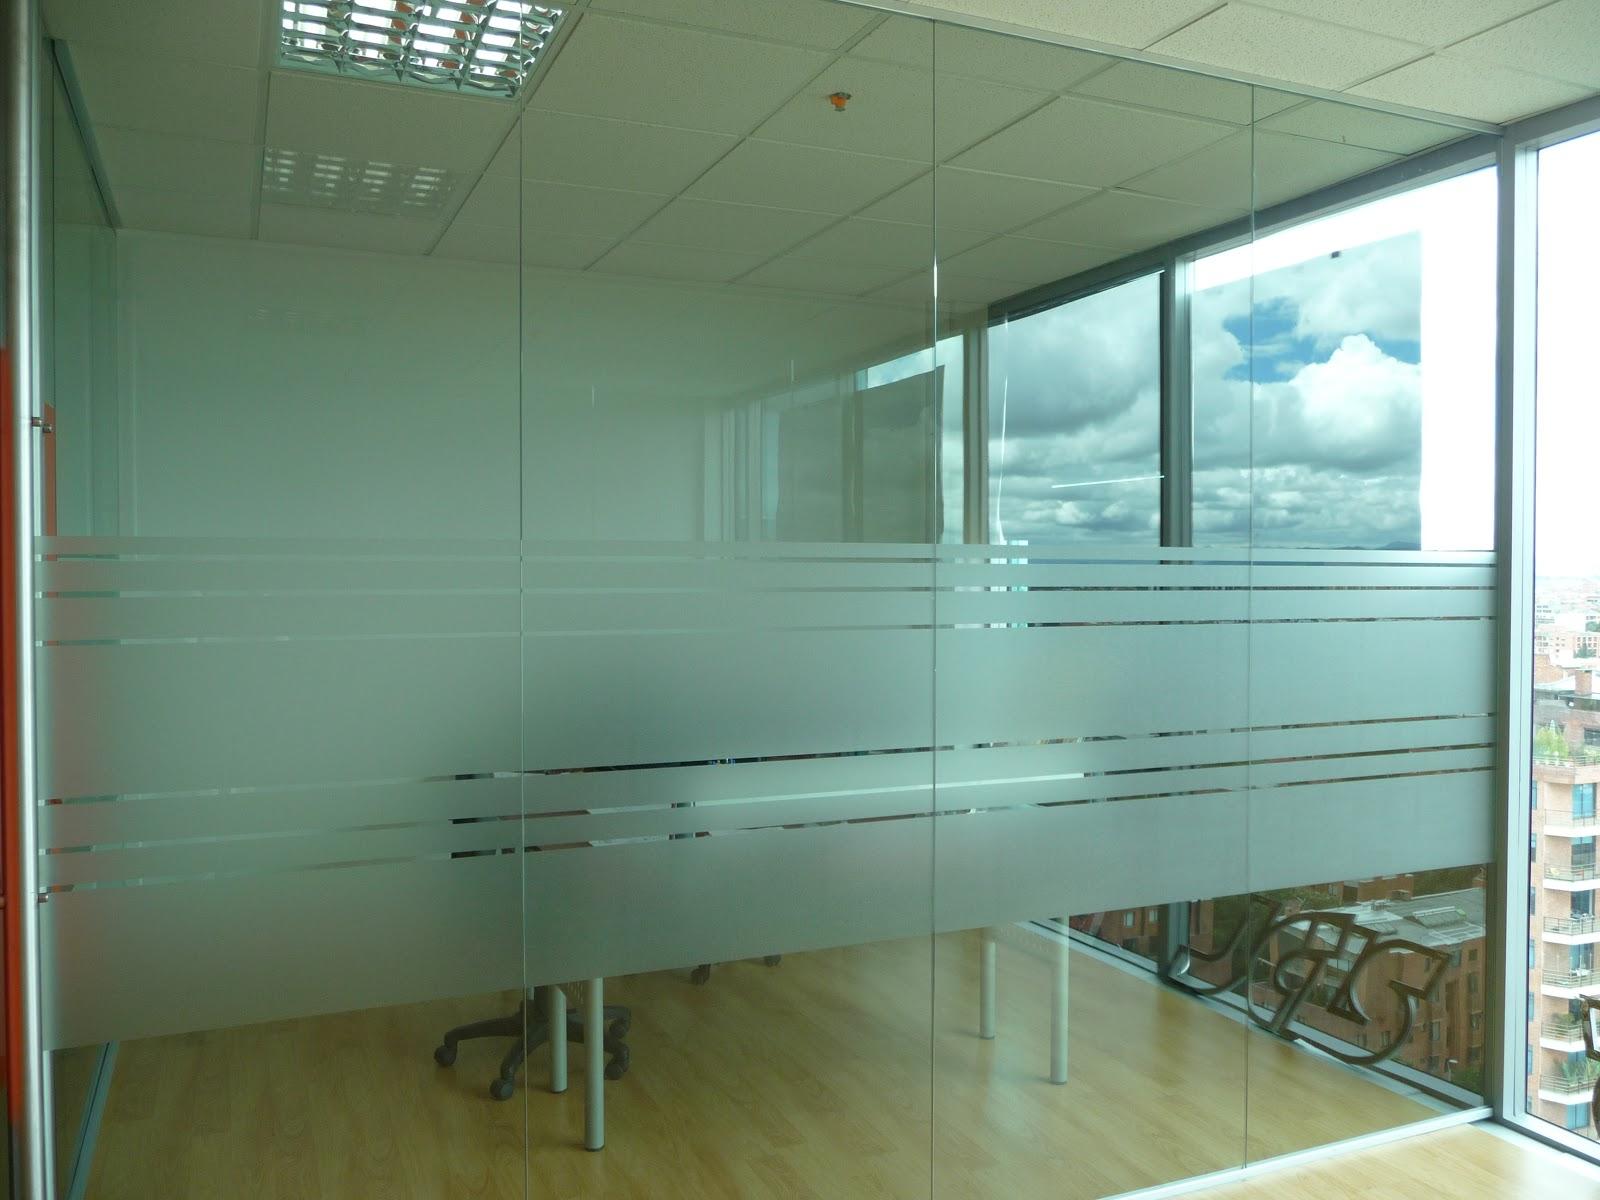 Vidrio Templado Reflecta Vidrio Templado Reflecta